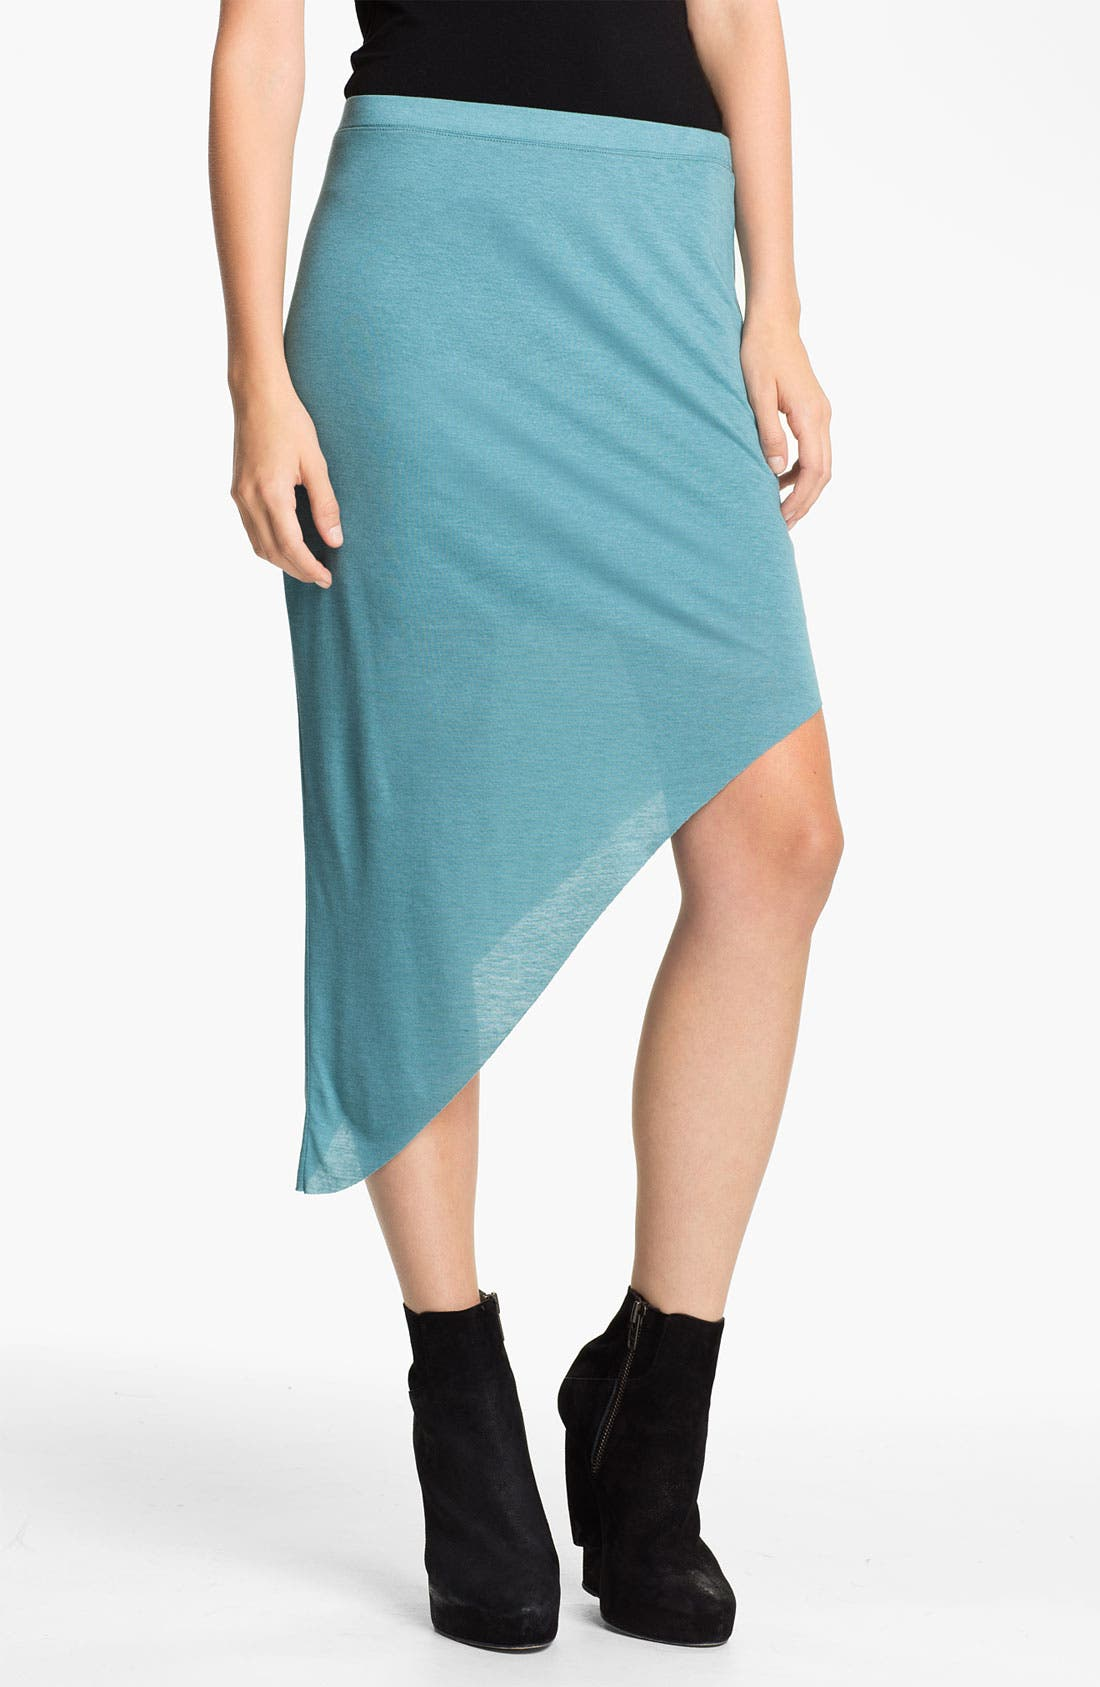 Main Image - HELMUT Helmut Lang 'Kinetic' Angled Jersey Skirt